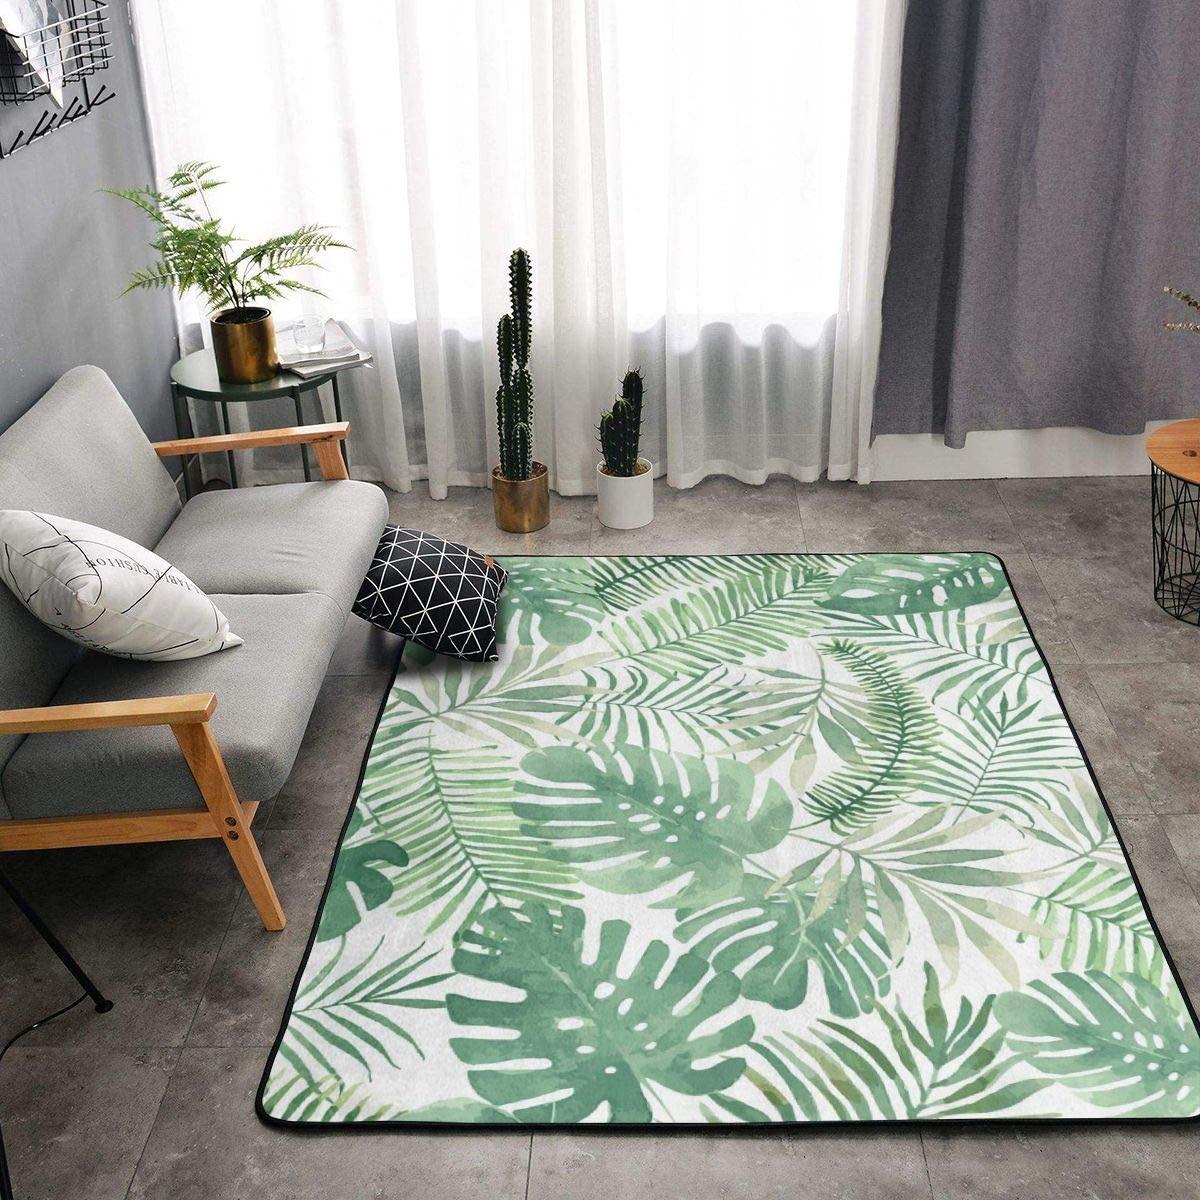 Area Rug Soft Fluffy Carpet for Bedroom Kids Teens Room, Modern Floor Mat Oversize Door Mat Plush Nursery Rugs for Boys Girls 80x58 in,Mauritius Green Leaves